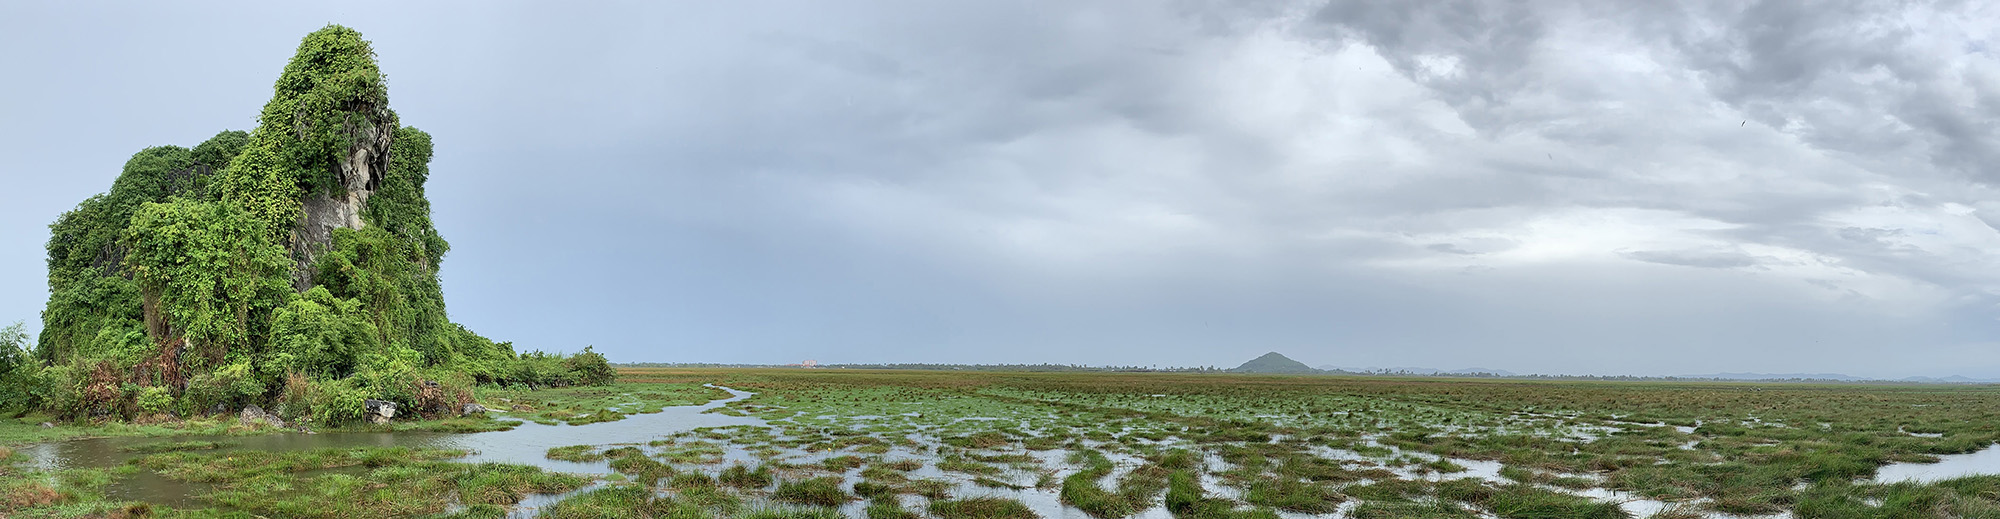 Cambodian Wetland